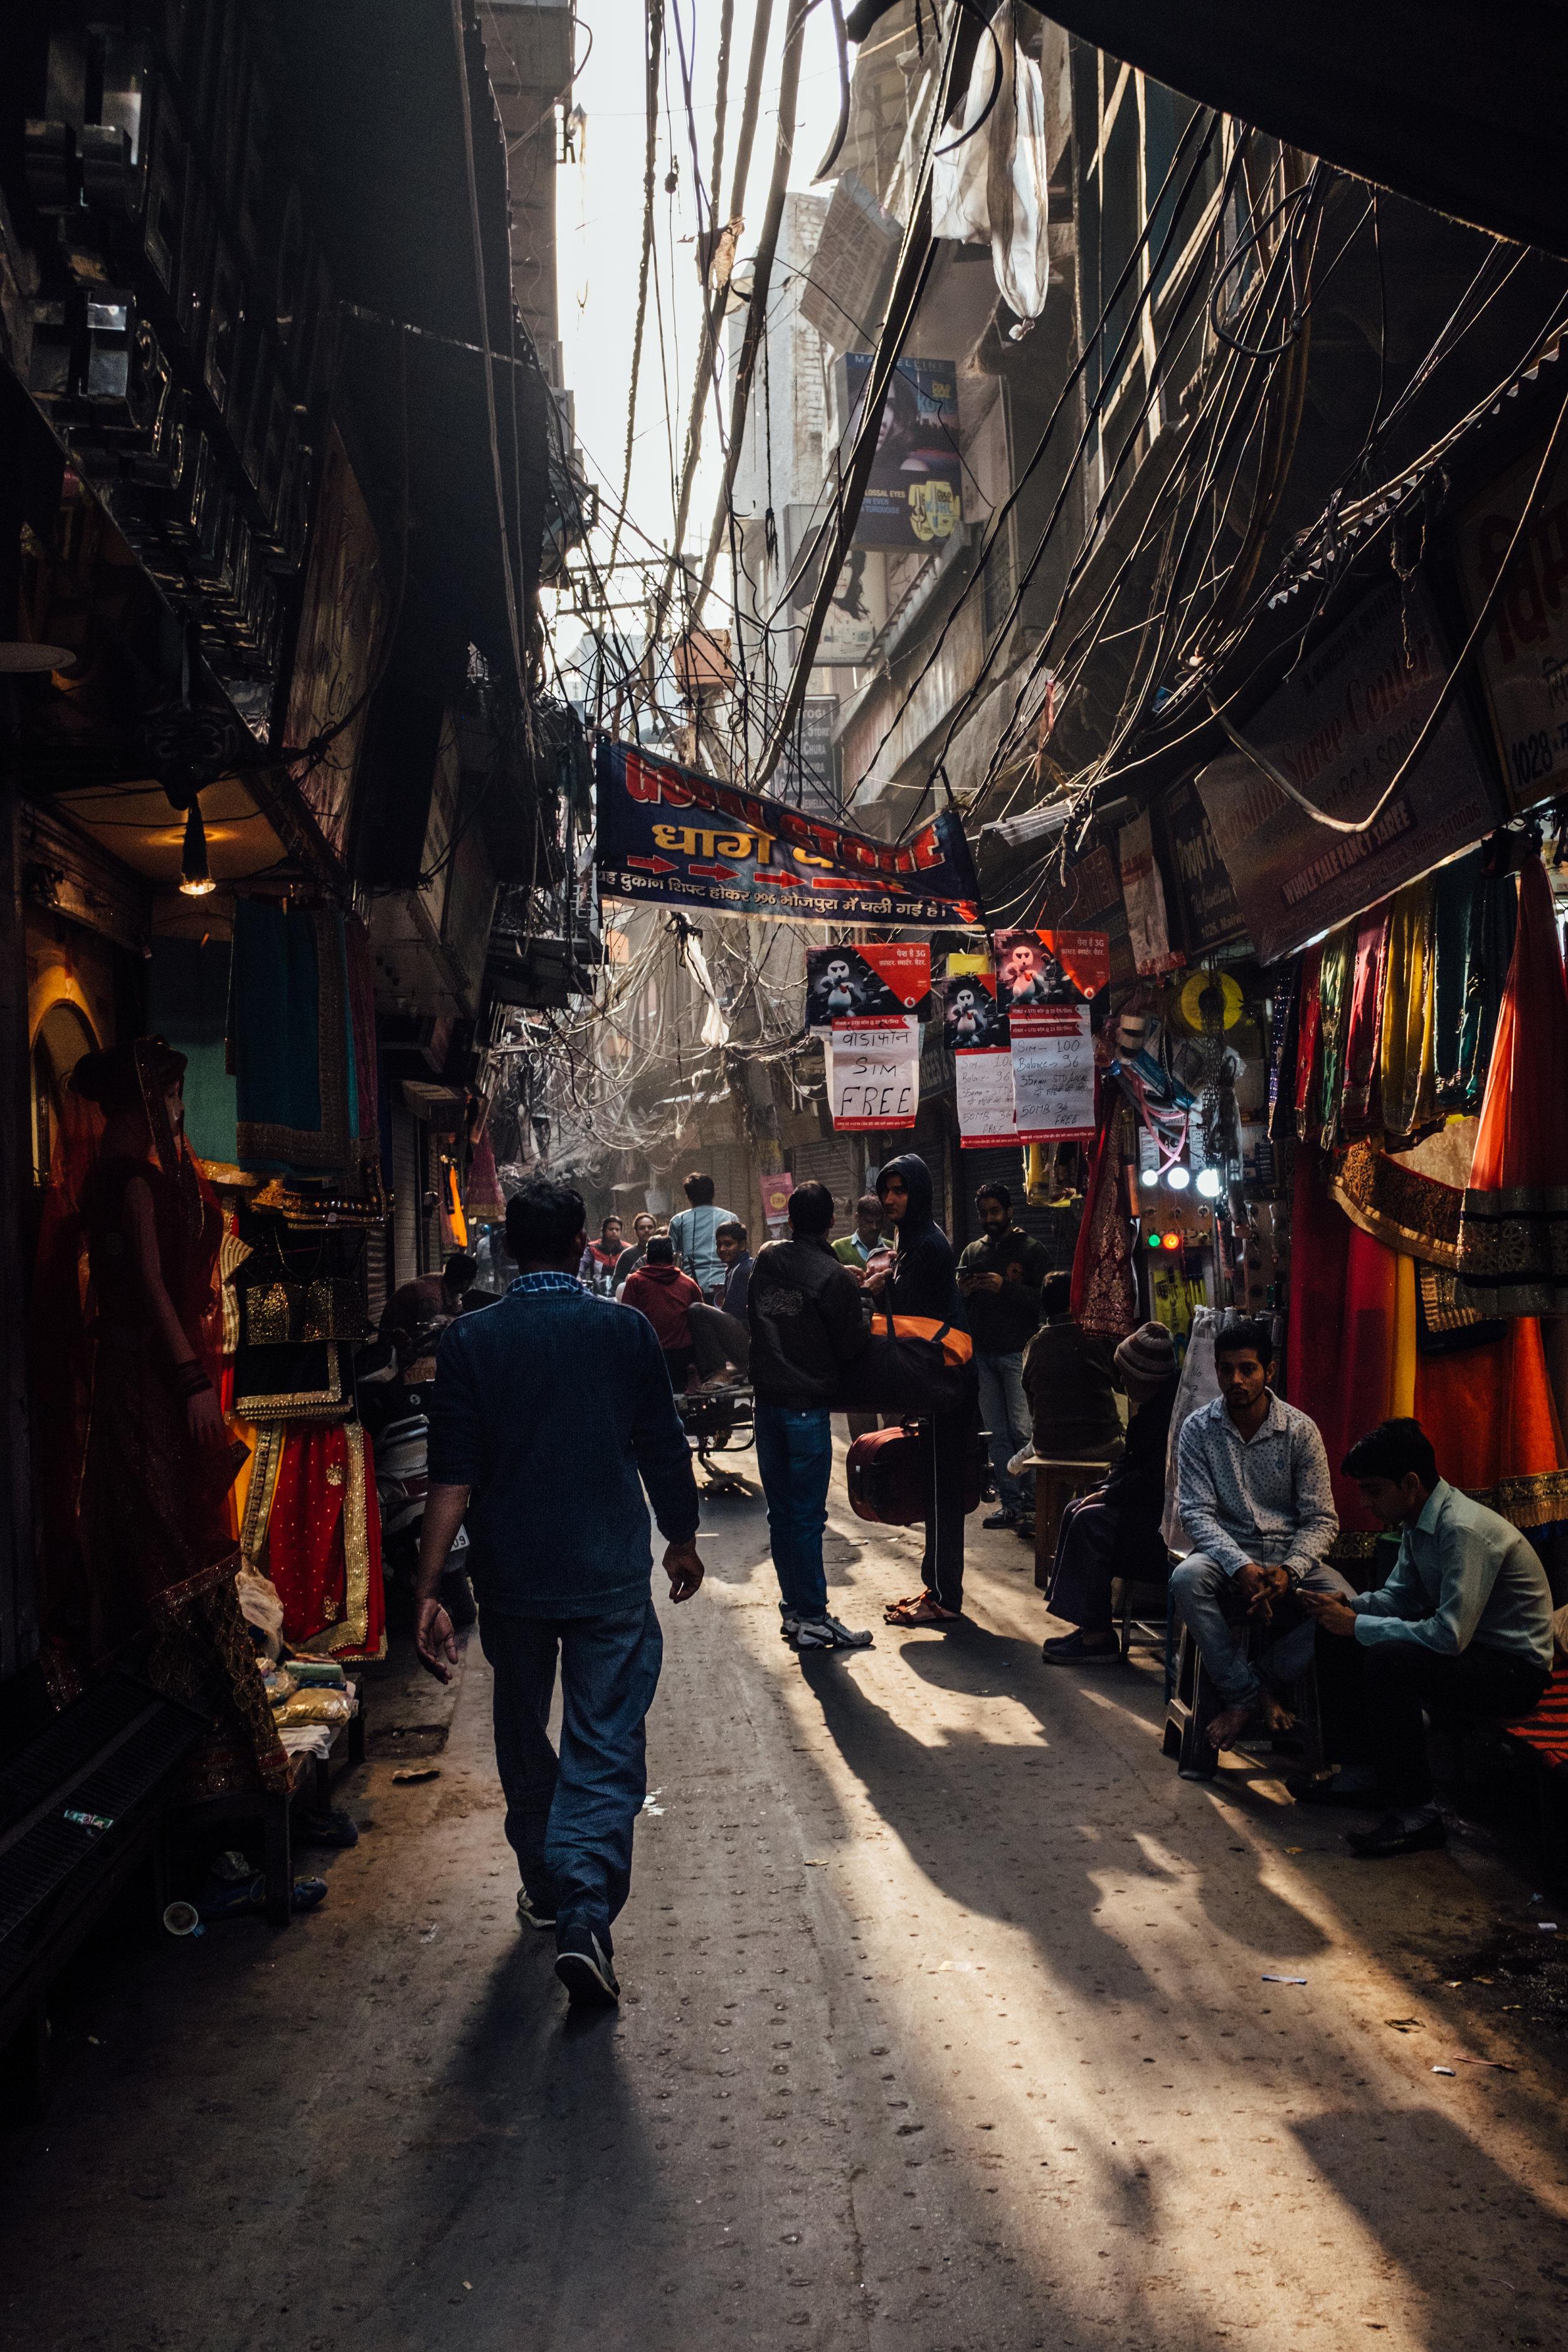 We took a rickshaw ride through Old Delhi